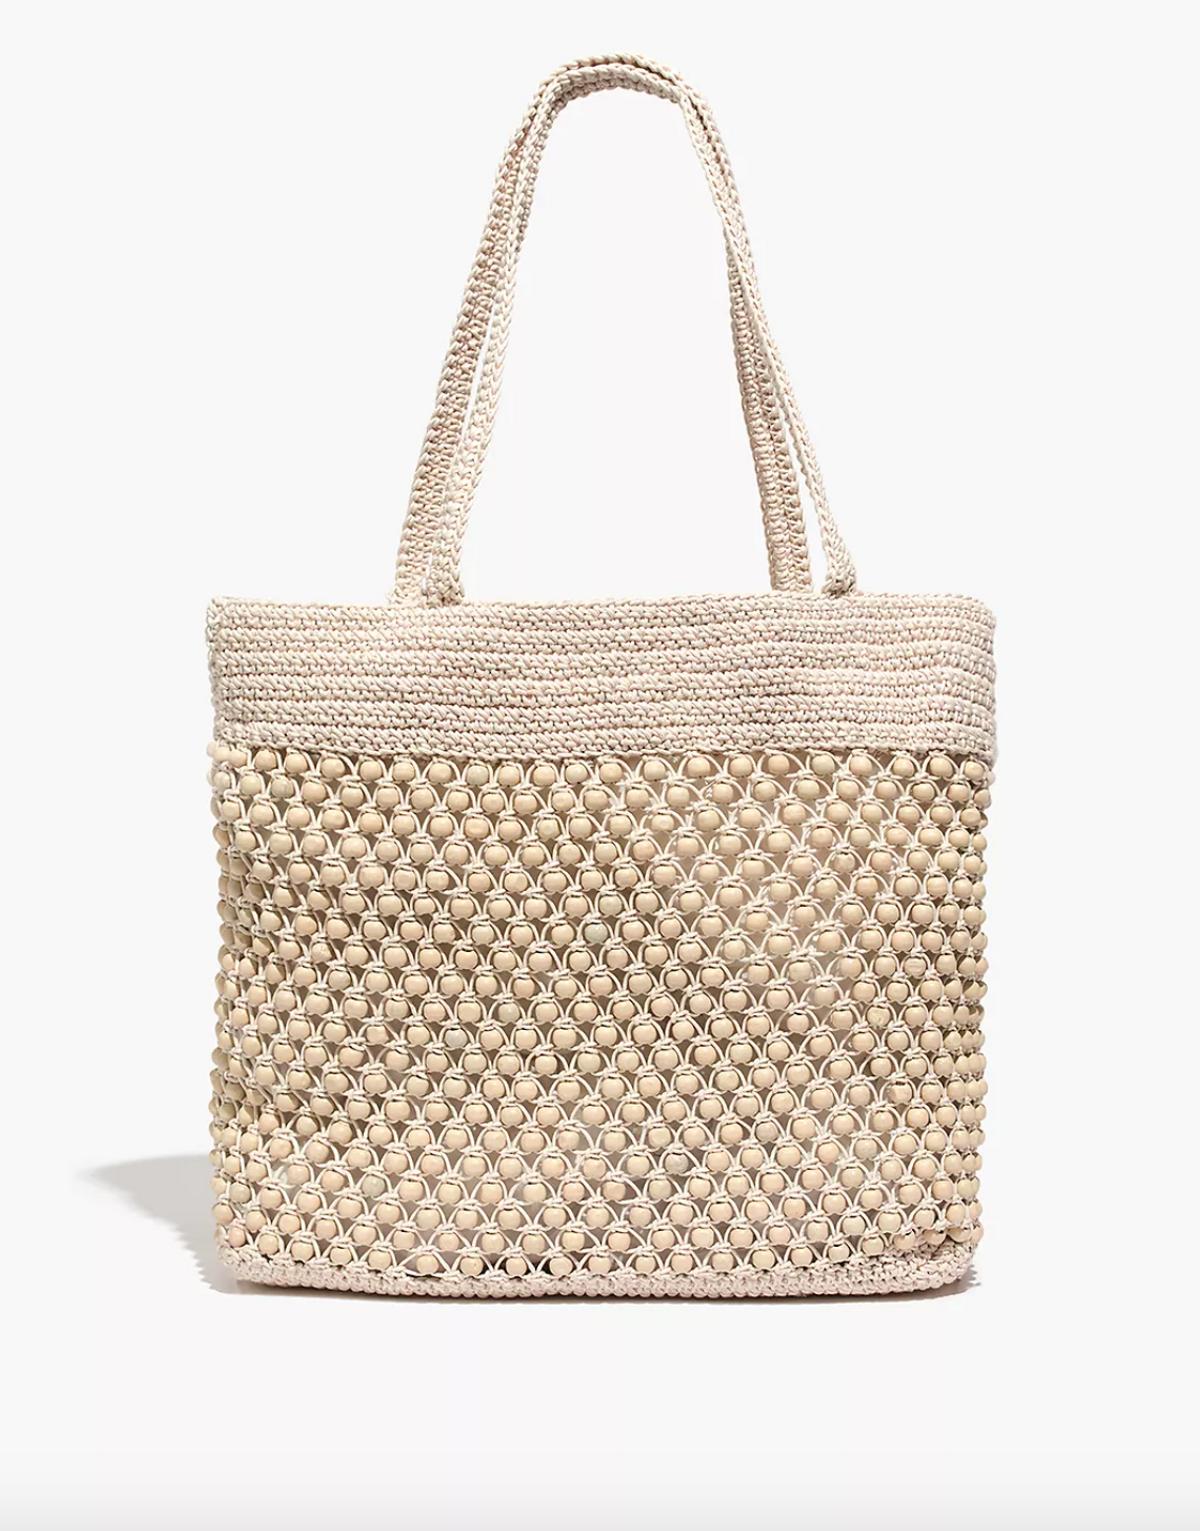 The Beaded Crochet Tote Bag